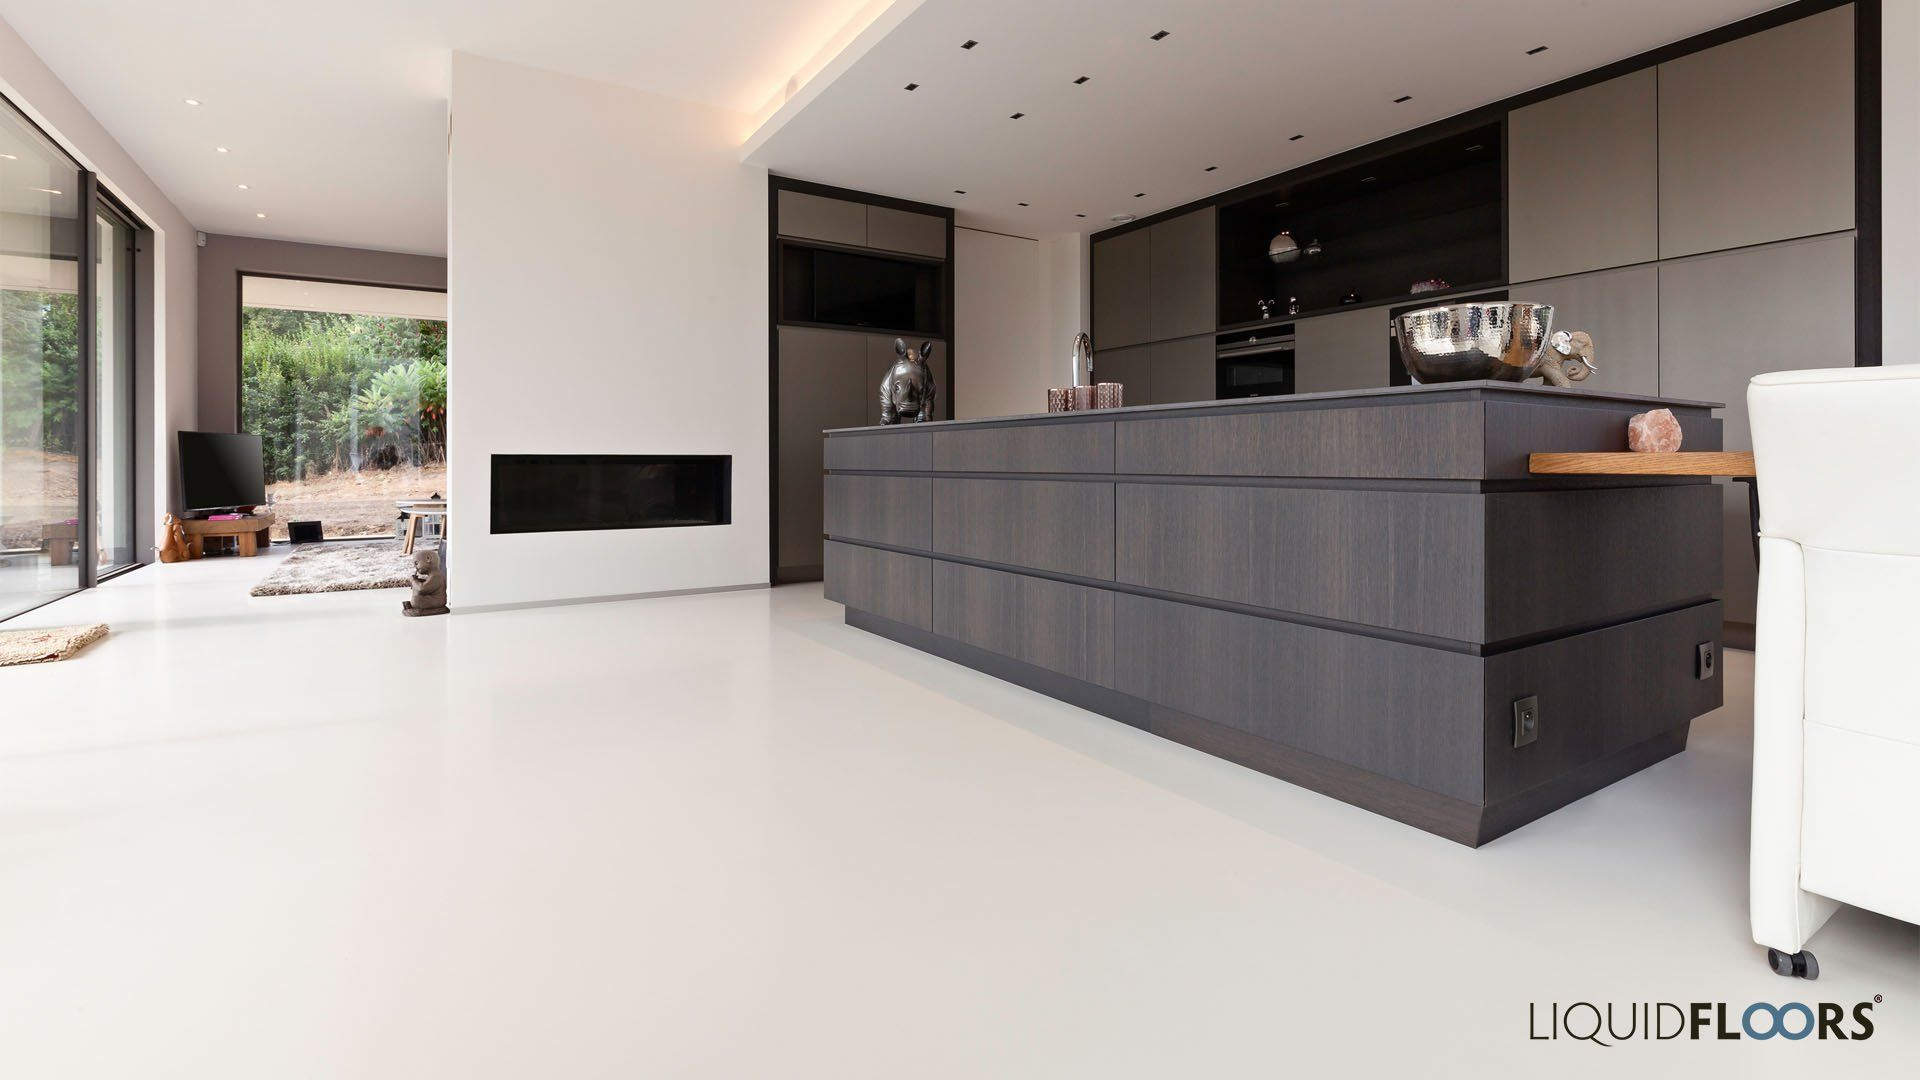 Keuken Modern Open : Open keuken met houten kookeiland in warmgrijze gietvloer modern